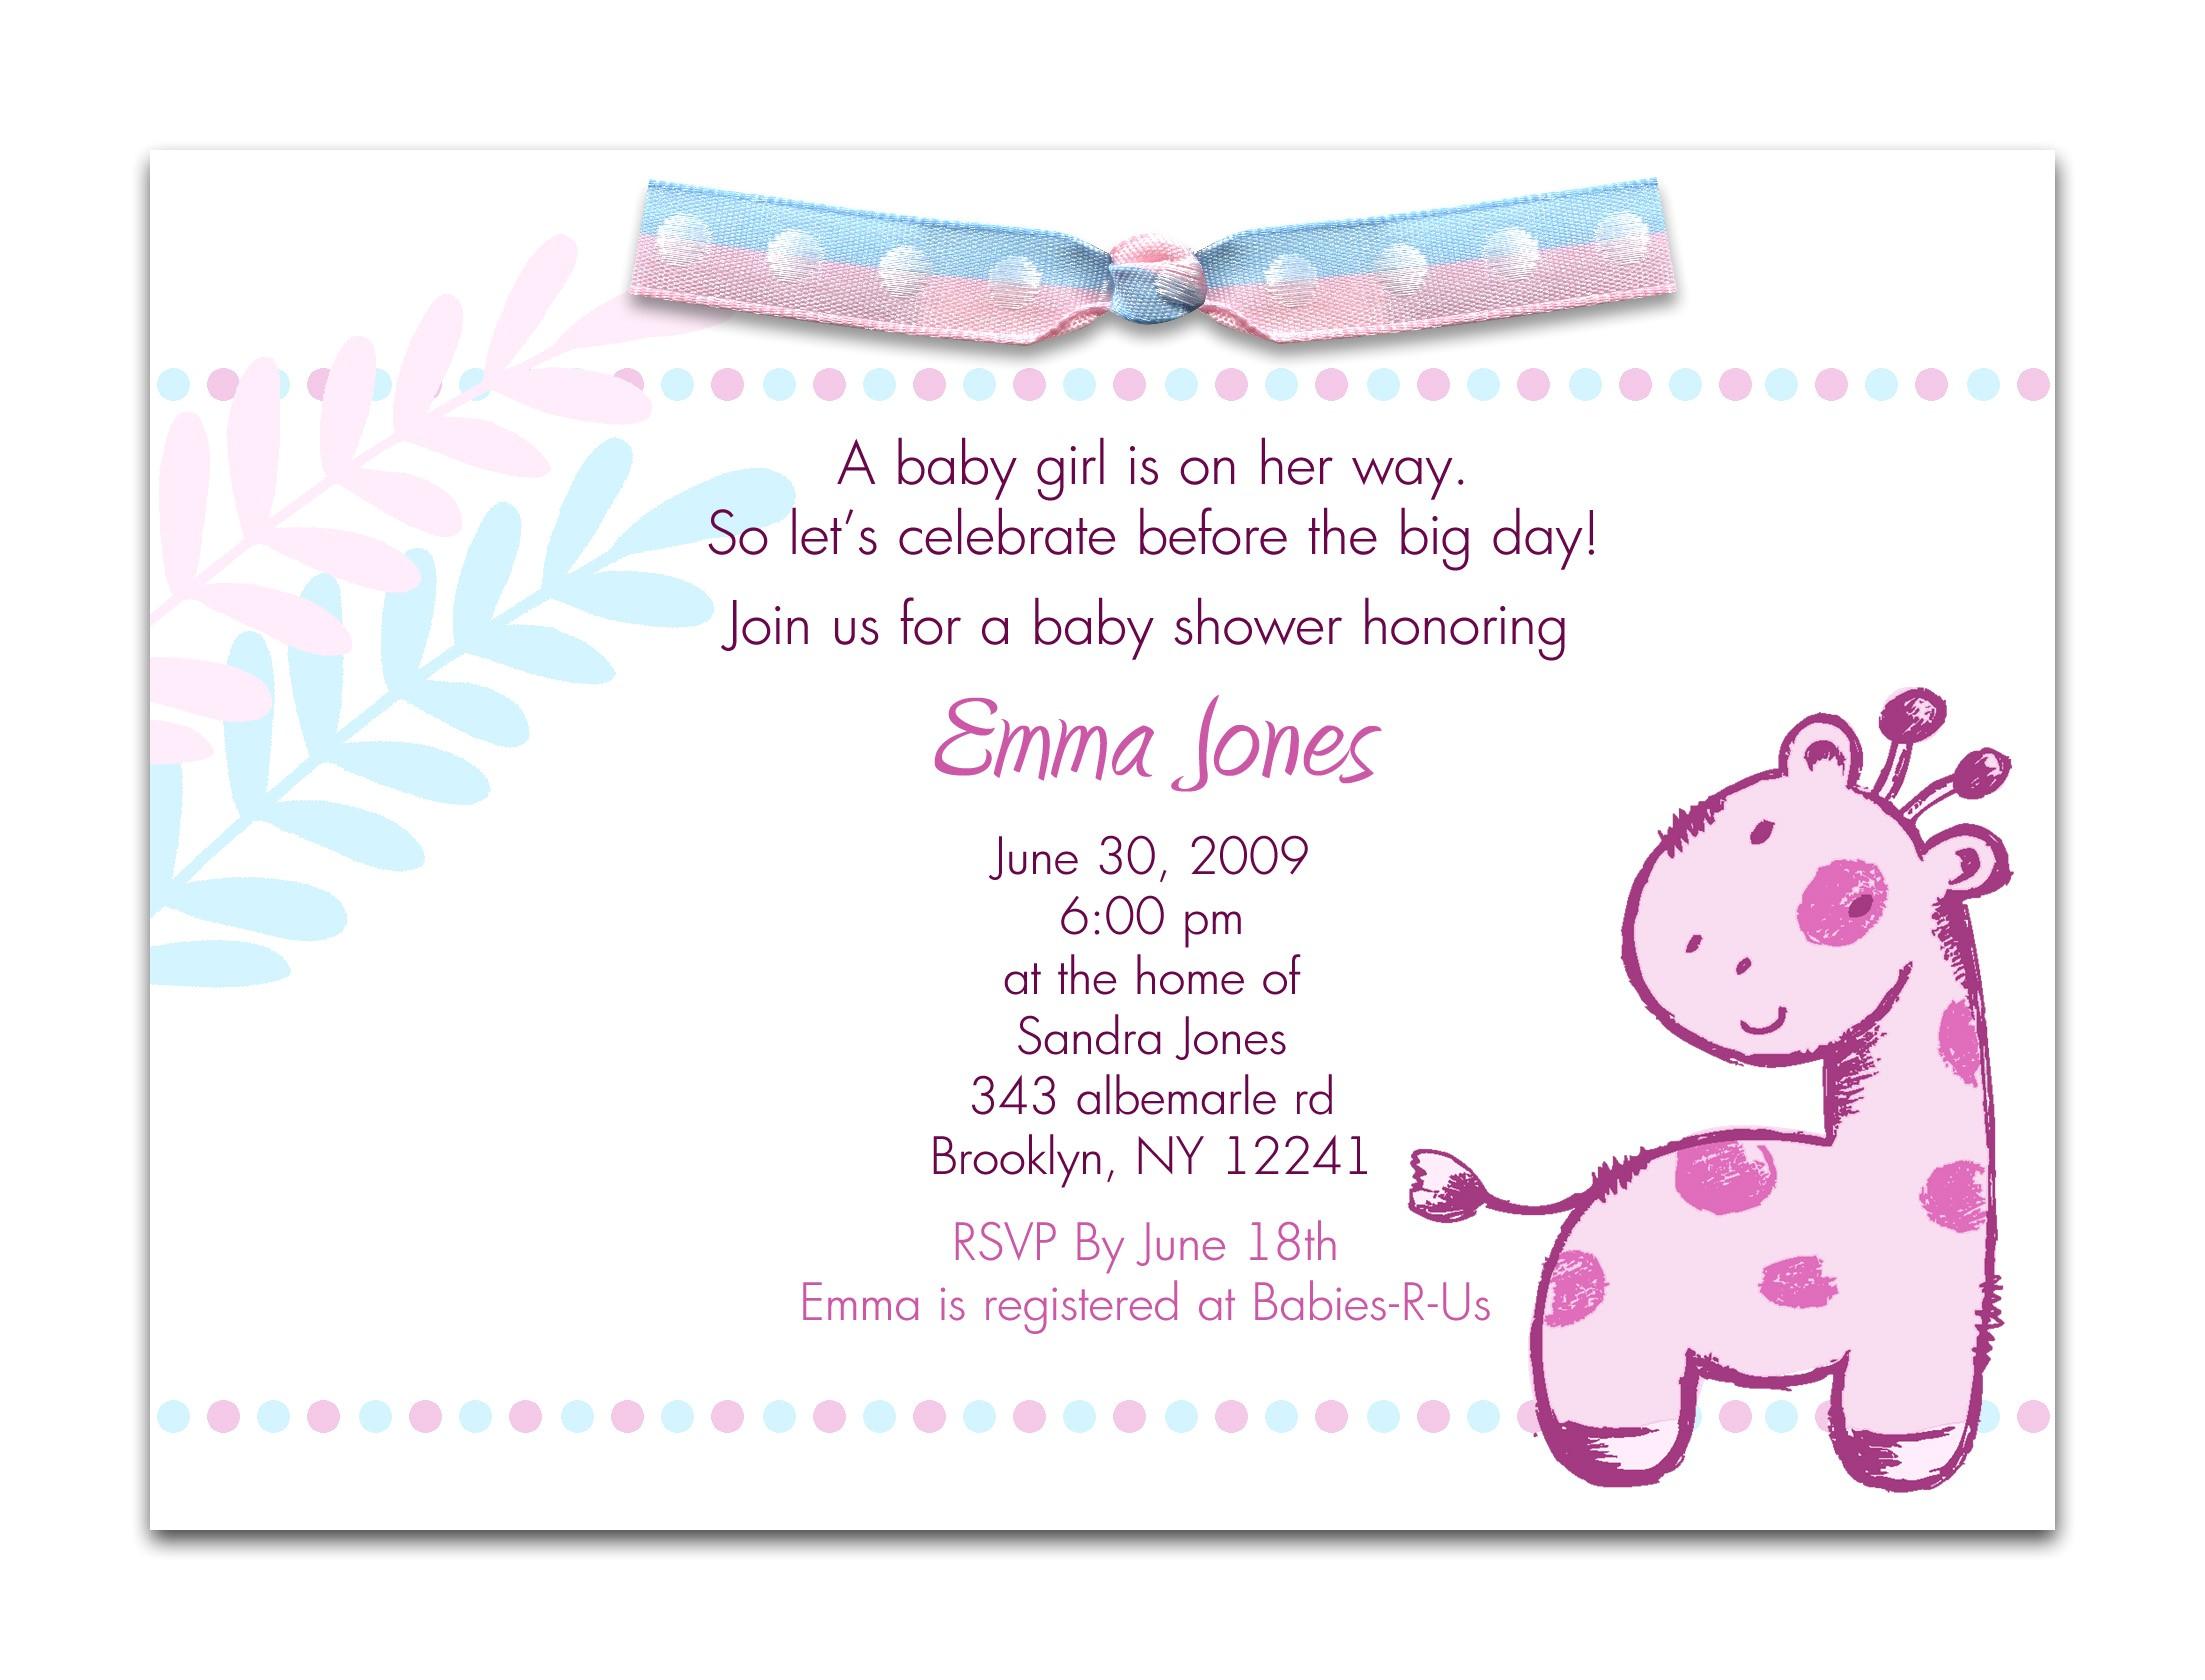 baby shower invitation wording ideas plus ethnic baby shower invitations plus printed baby shower invitations plus shower invitation wording